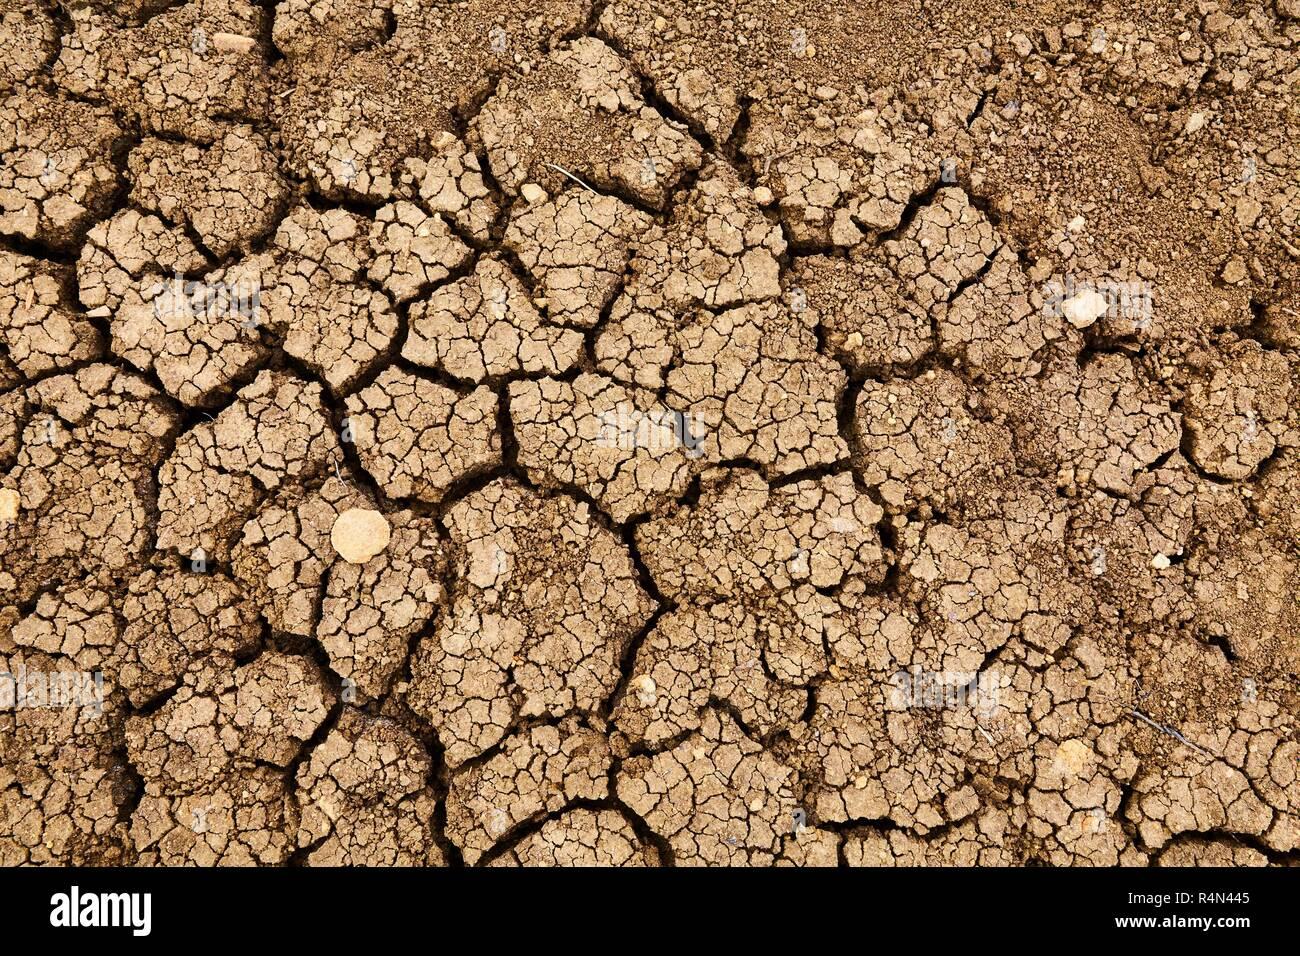 Dry Soil Texture - Stock Image